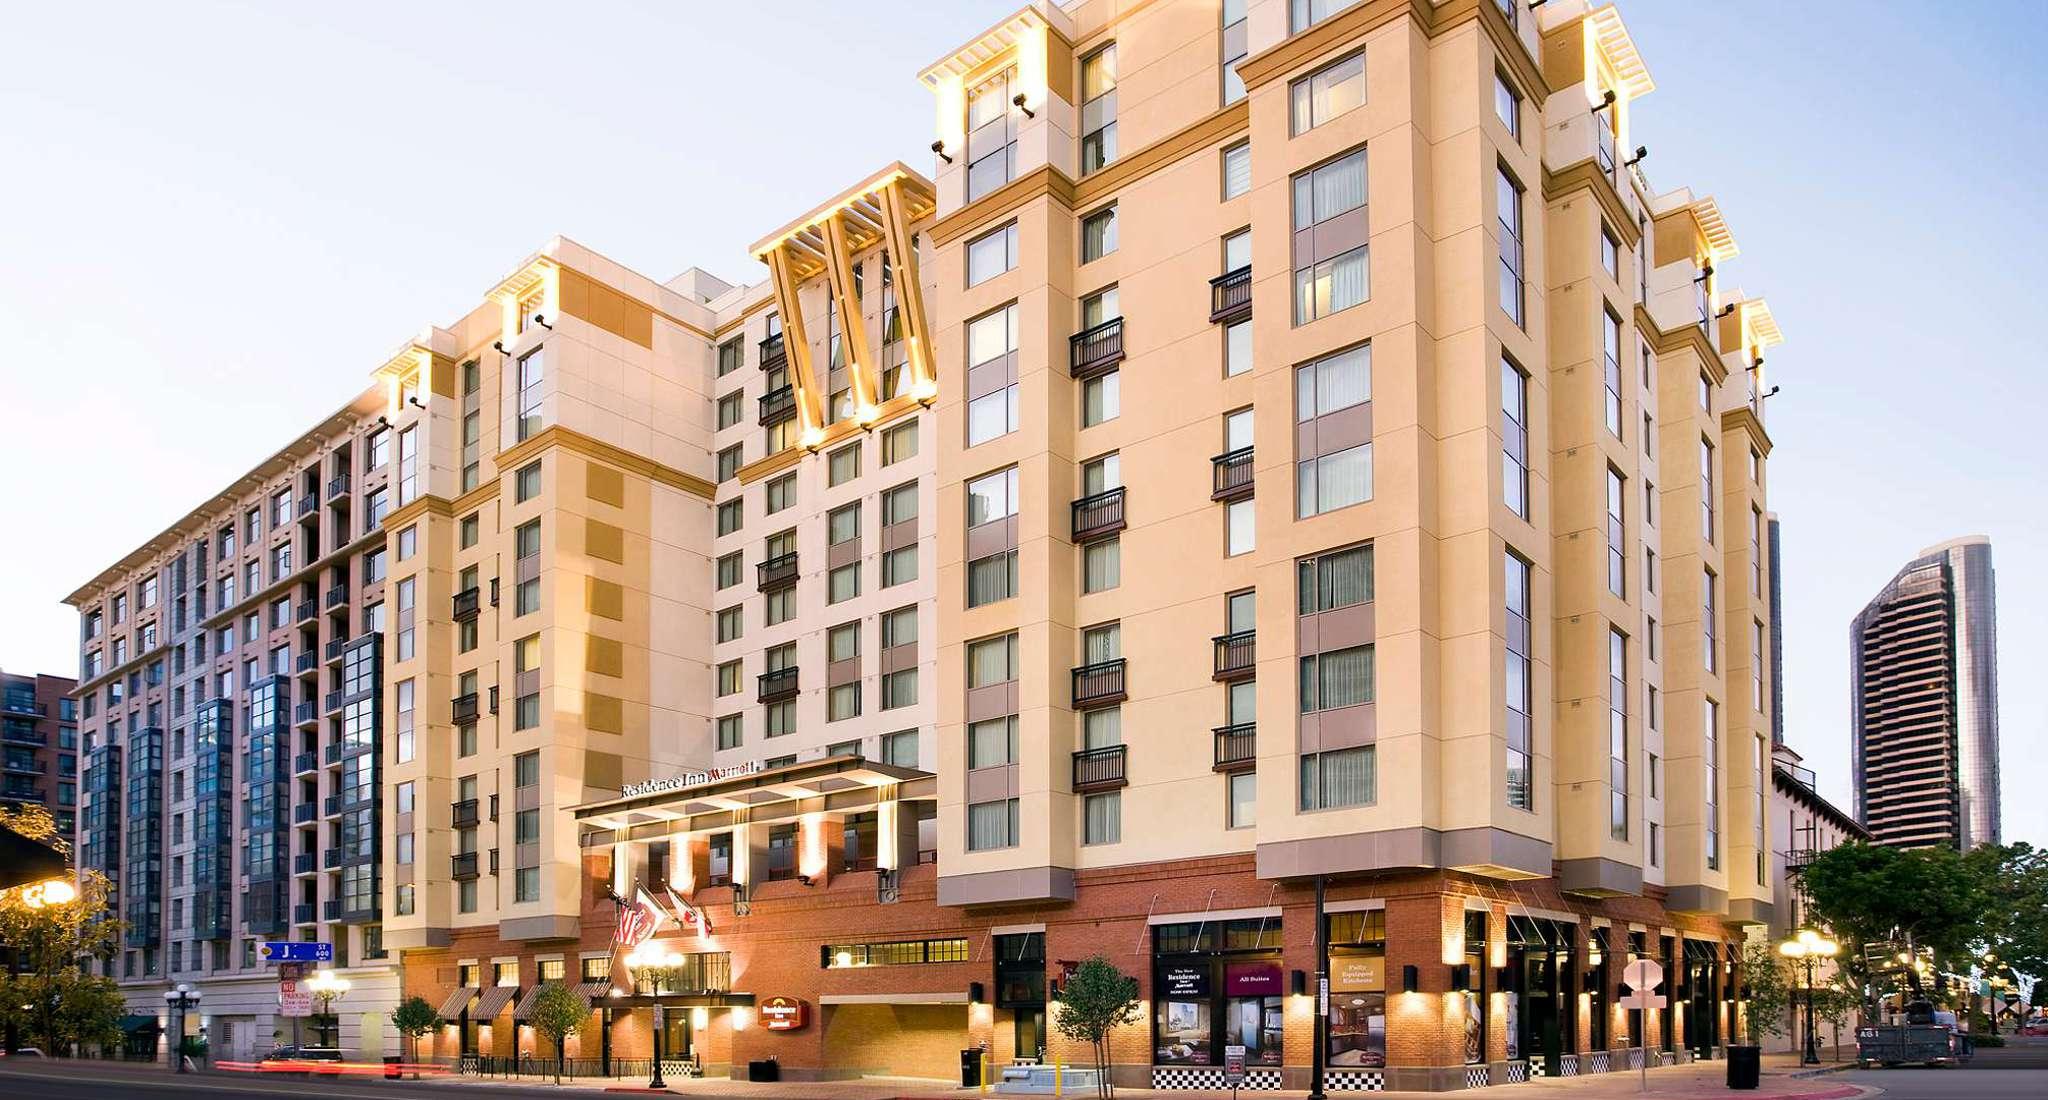 marriott residence inn Gaslamp quarter | San diego